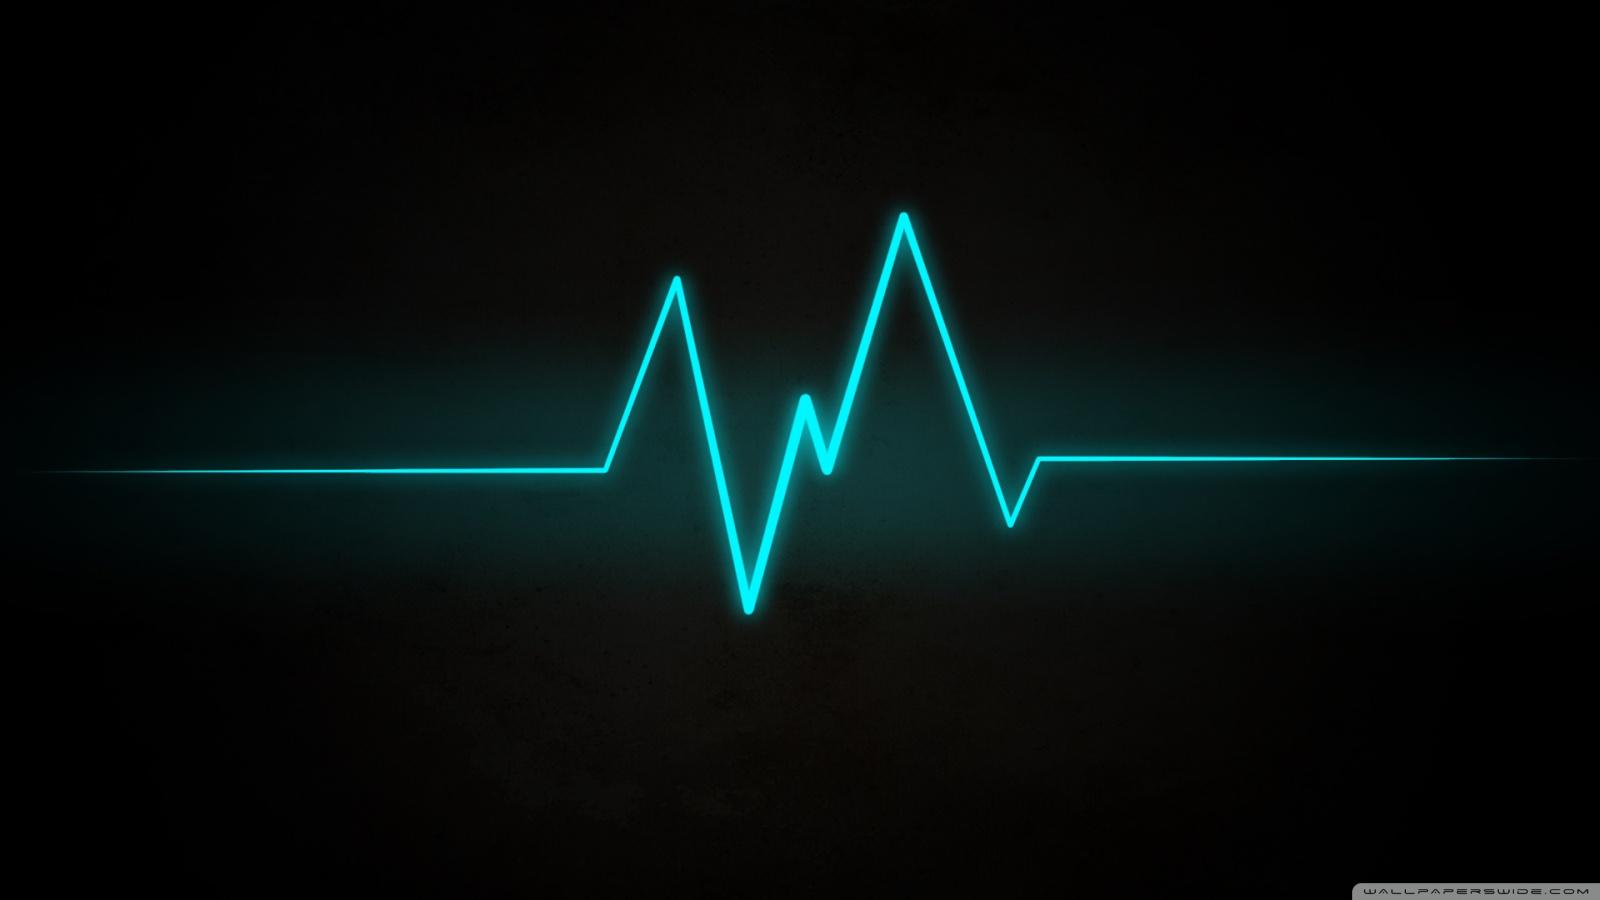 Free Heart Beat phone wallpaper by maliky169